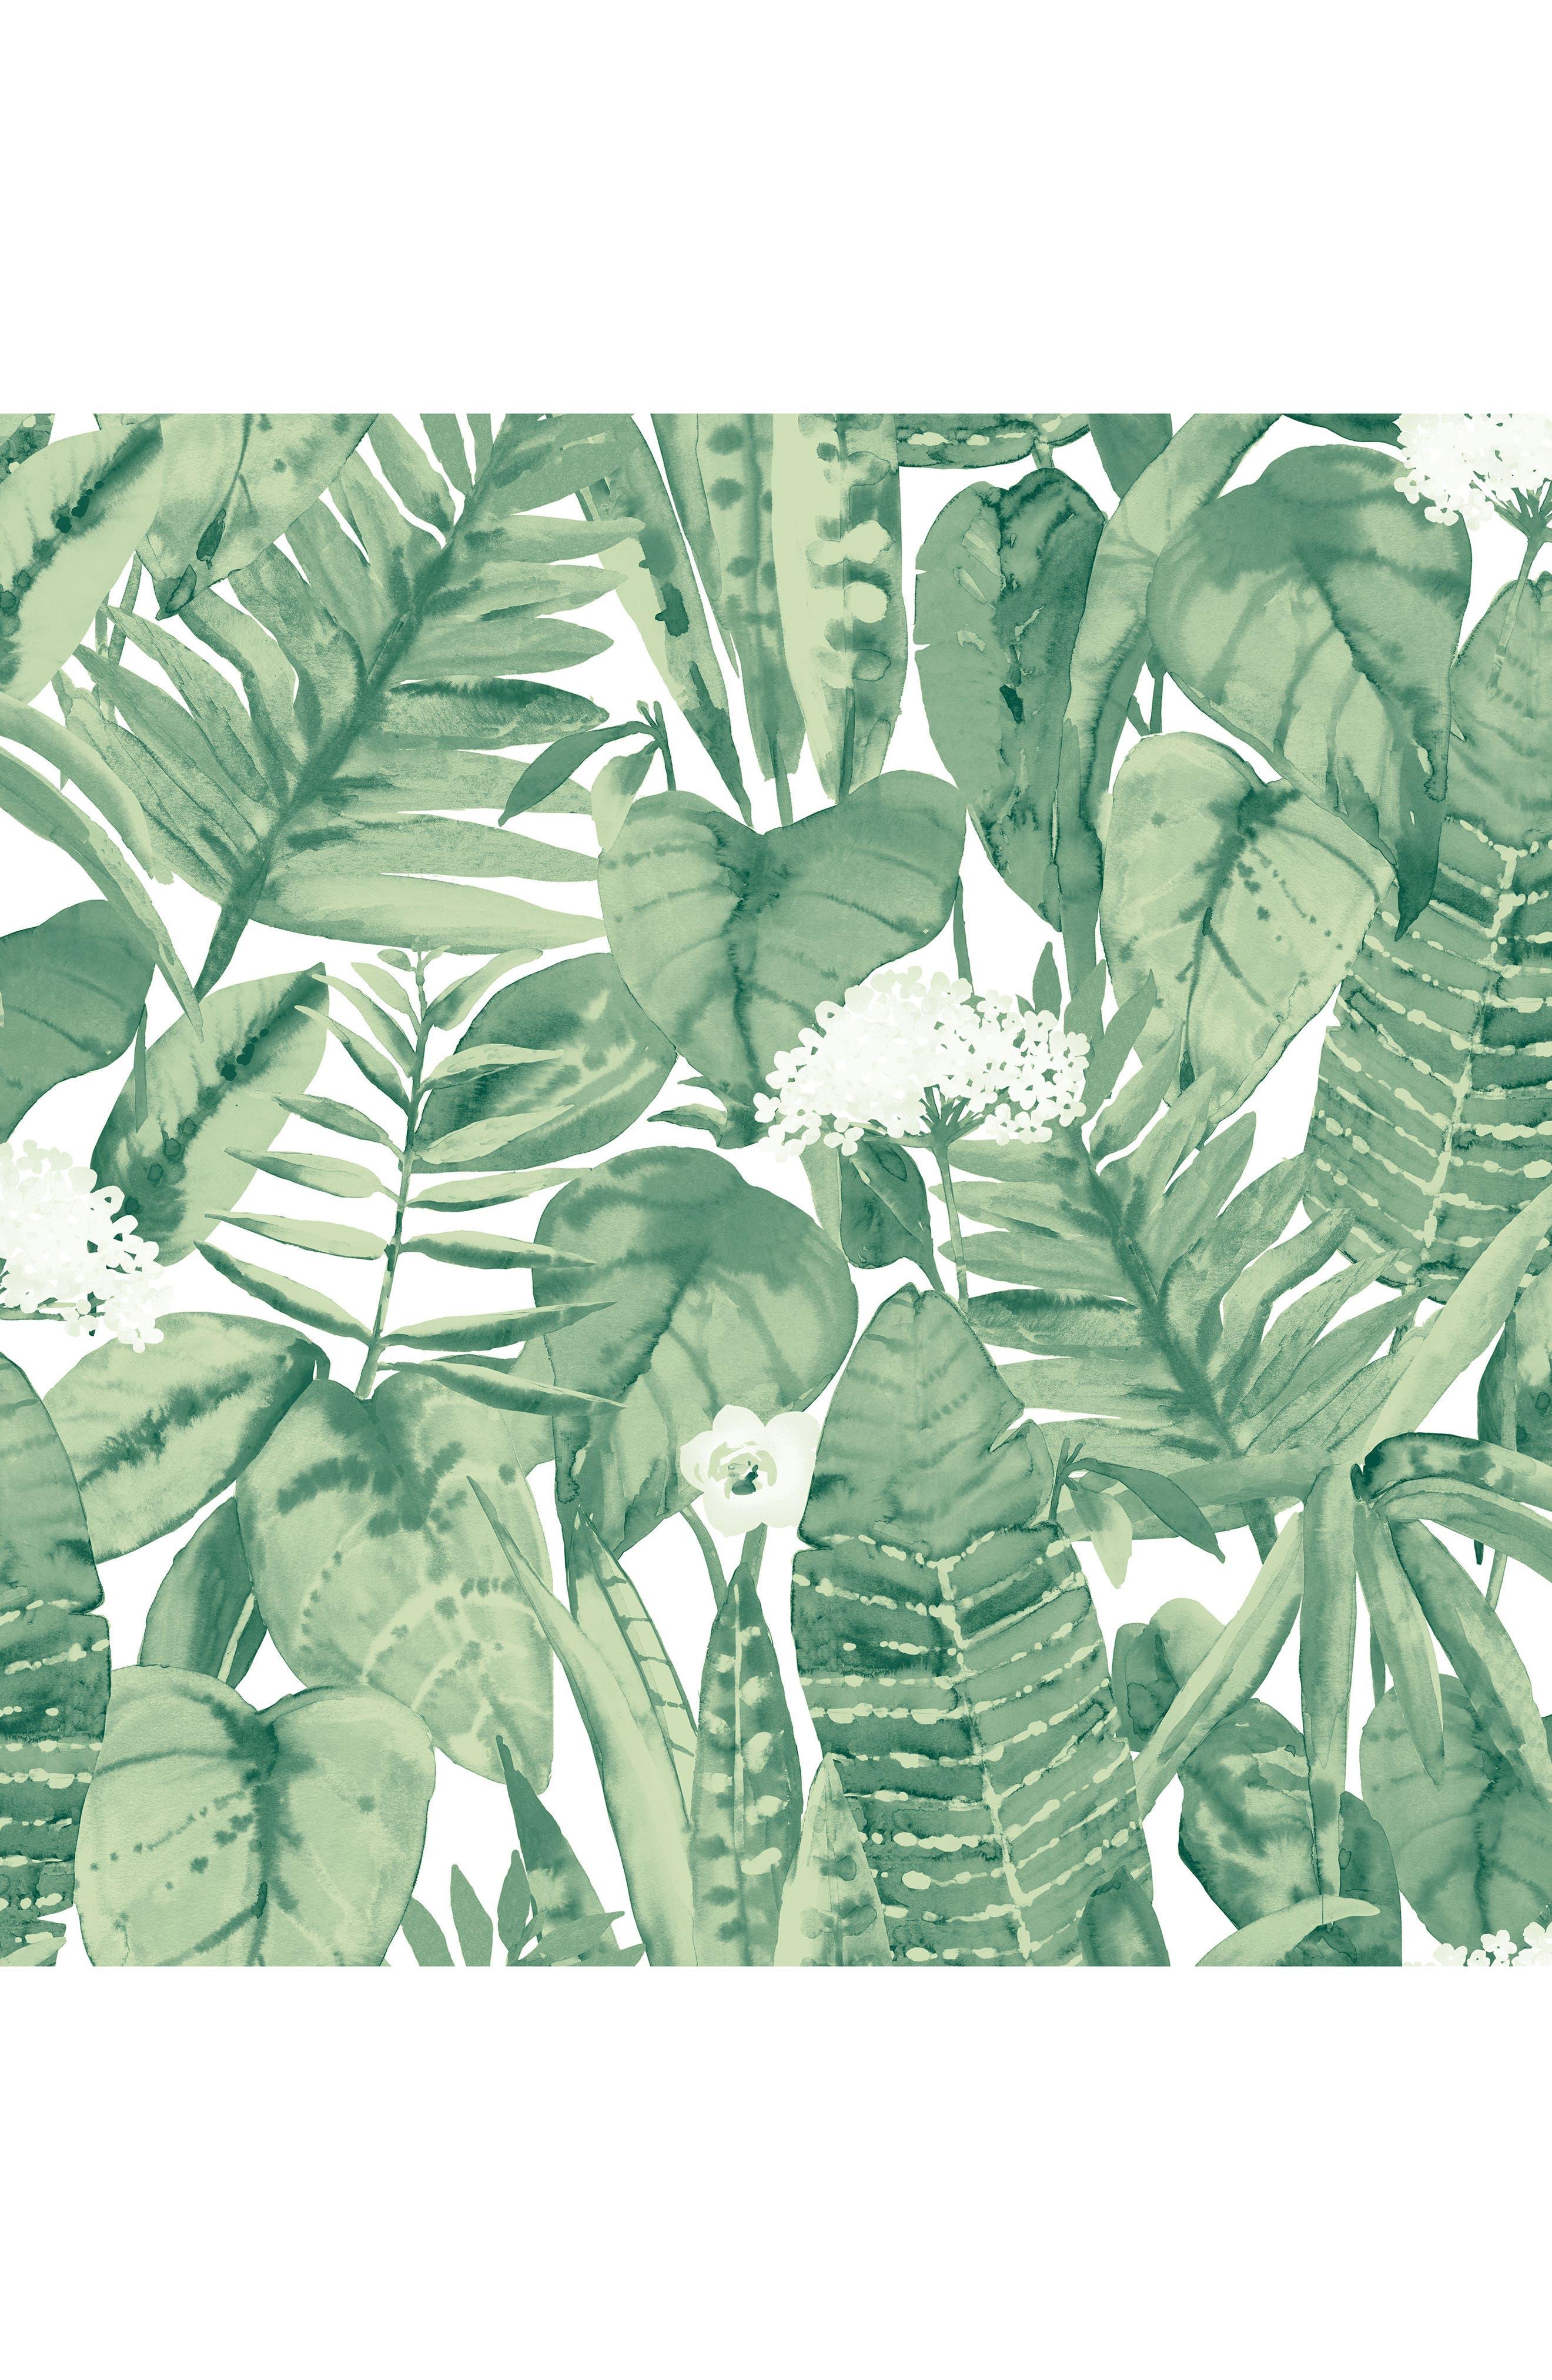 Tropical Self-Adhesive Vinyl Wallpaper,                             Main thumbnail 1, color,                             300